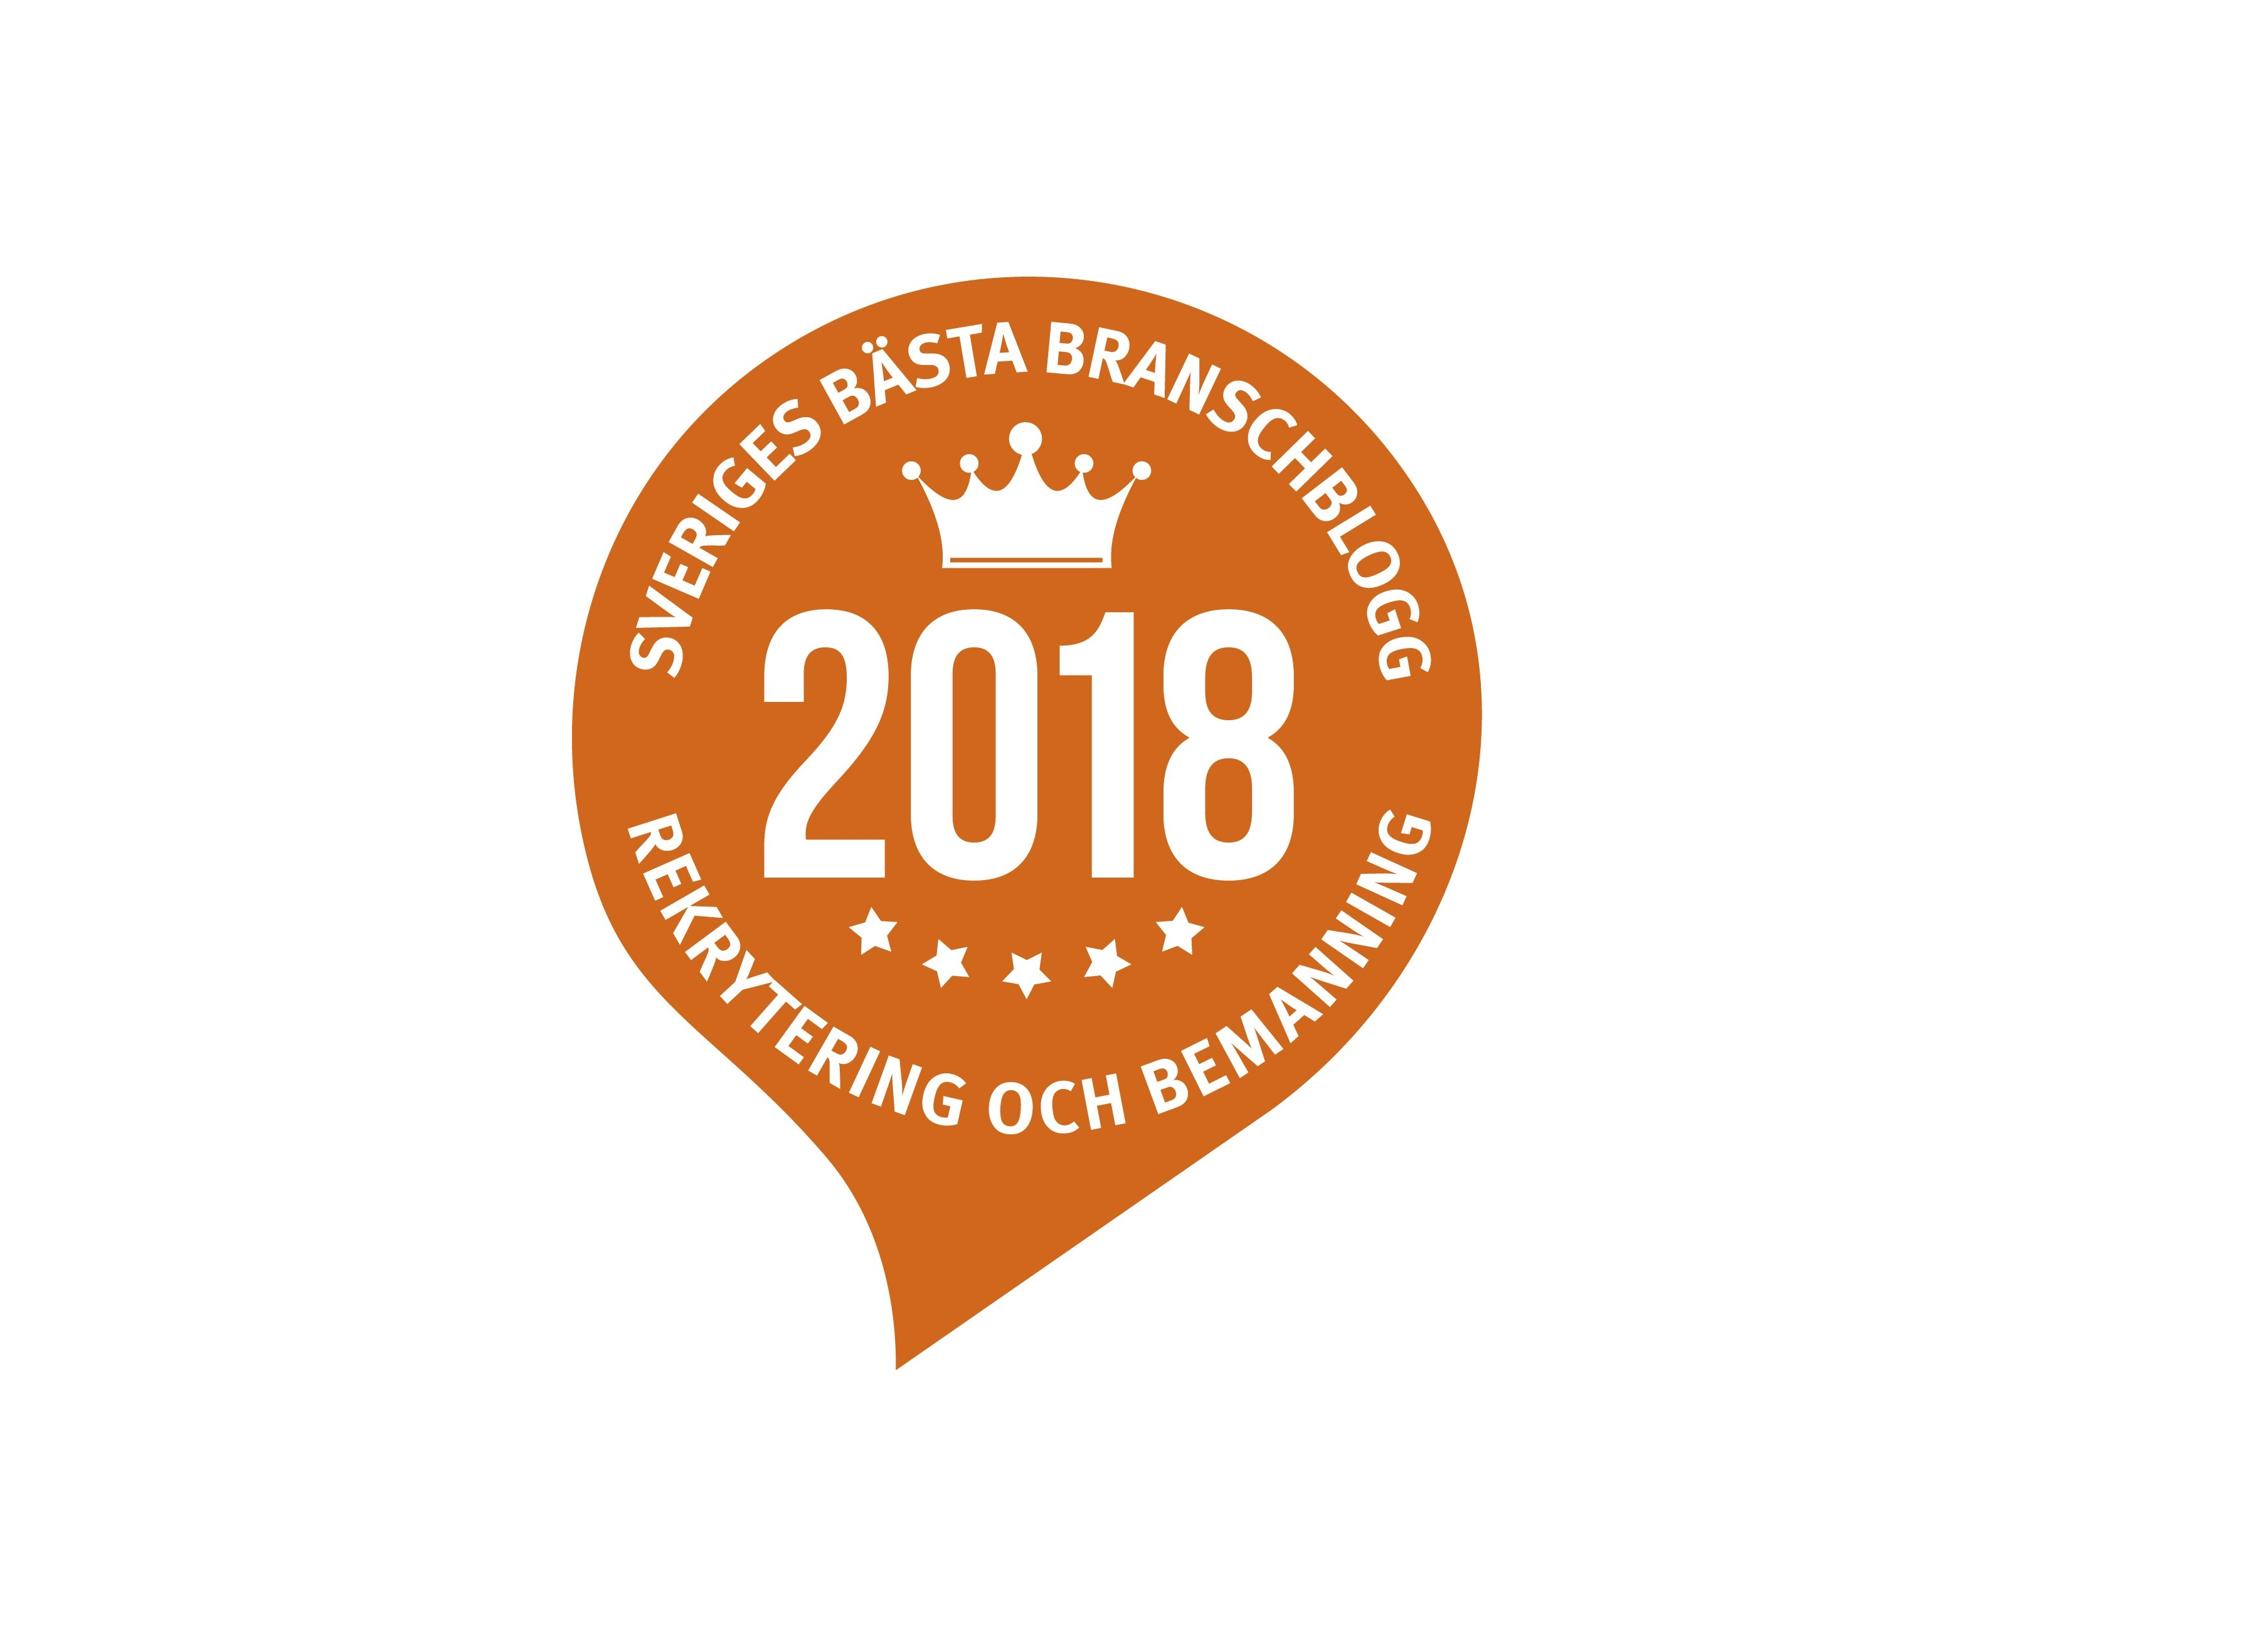 Sveriges bästa branschblogg 2018